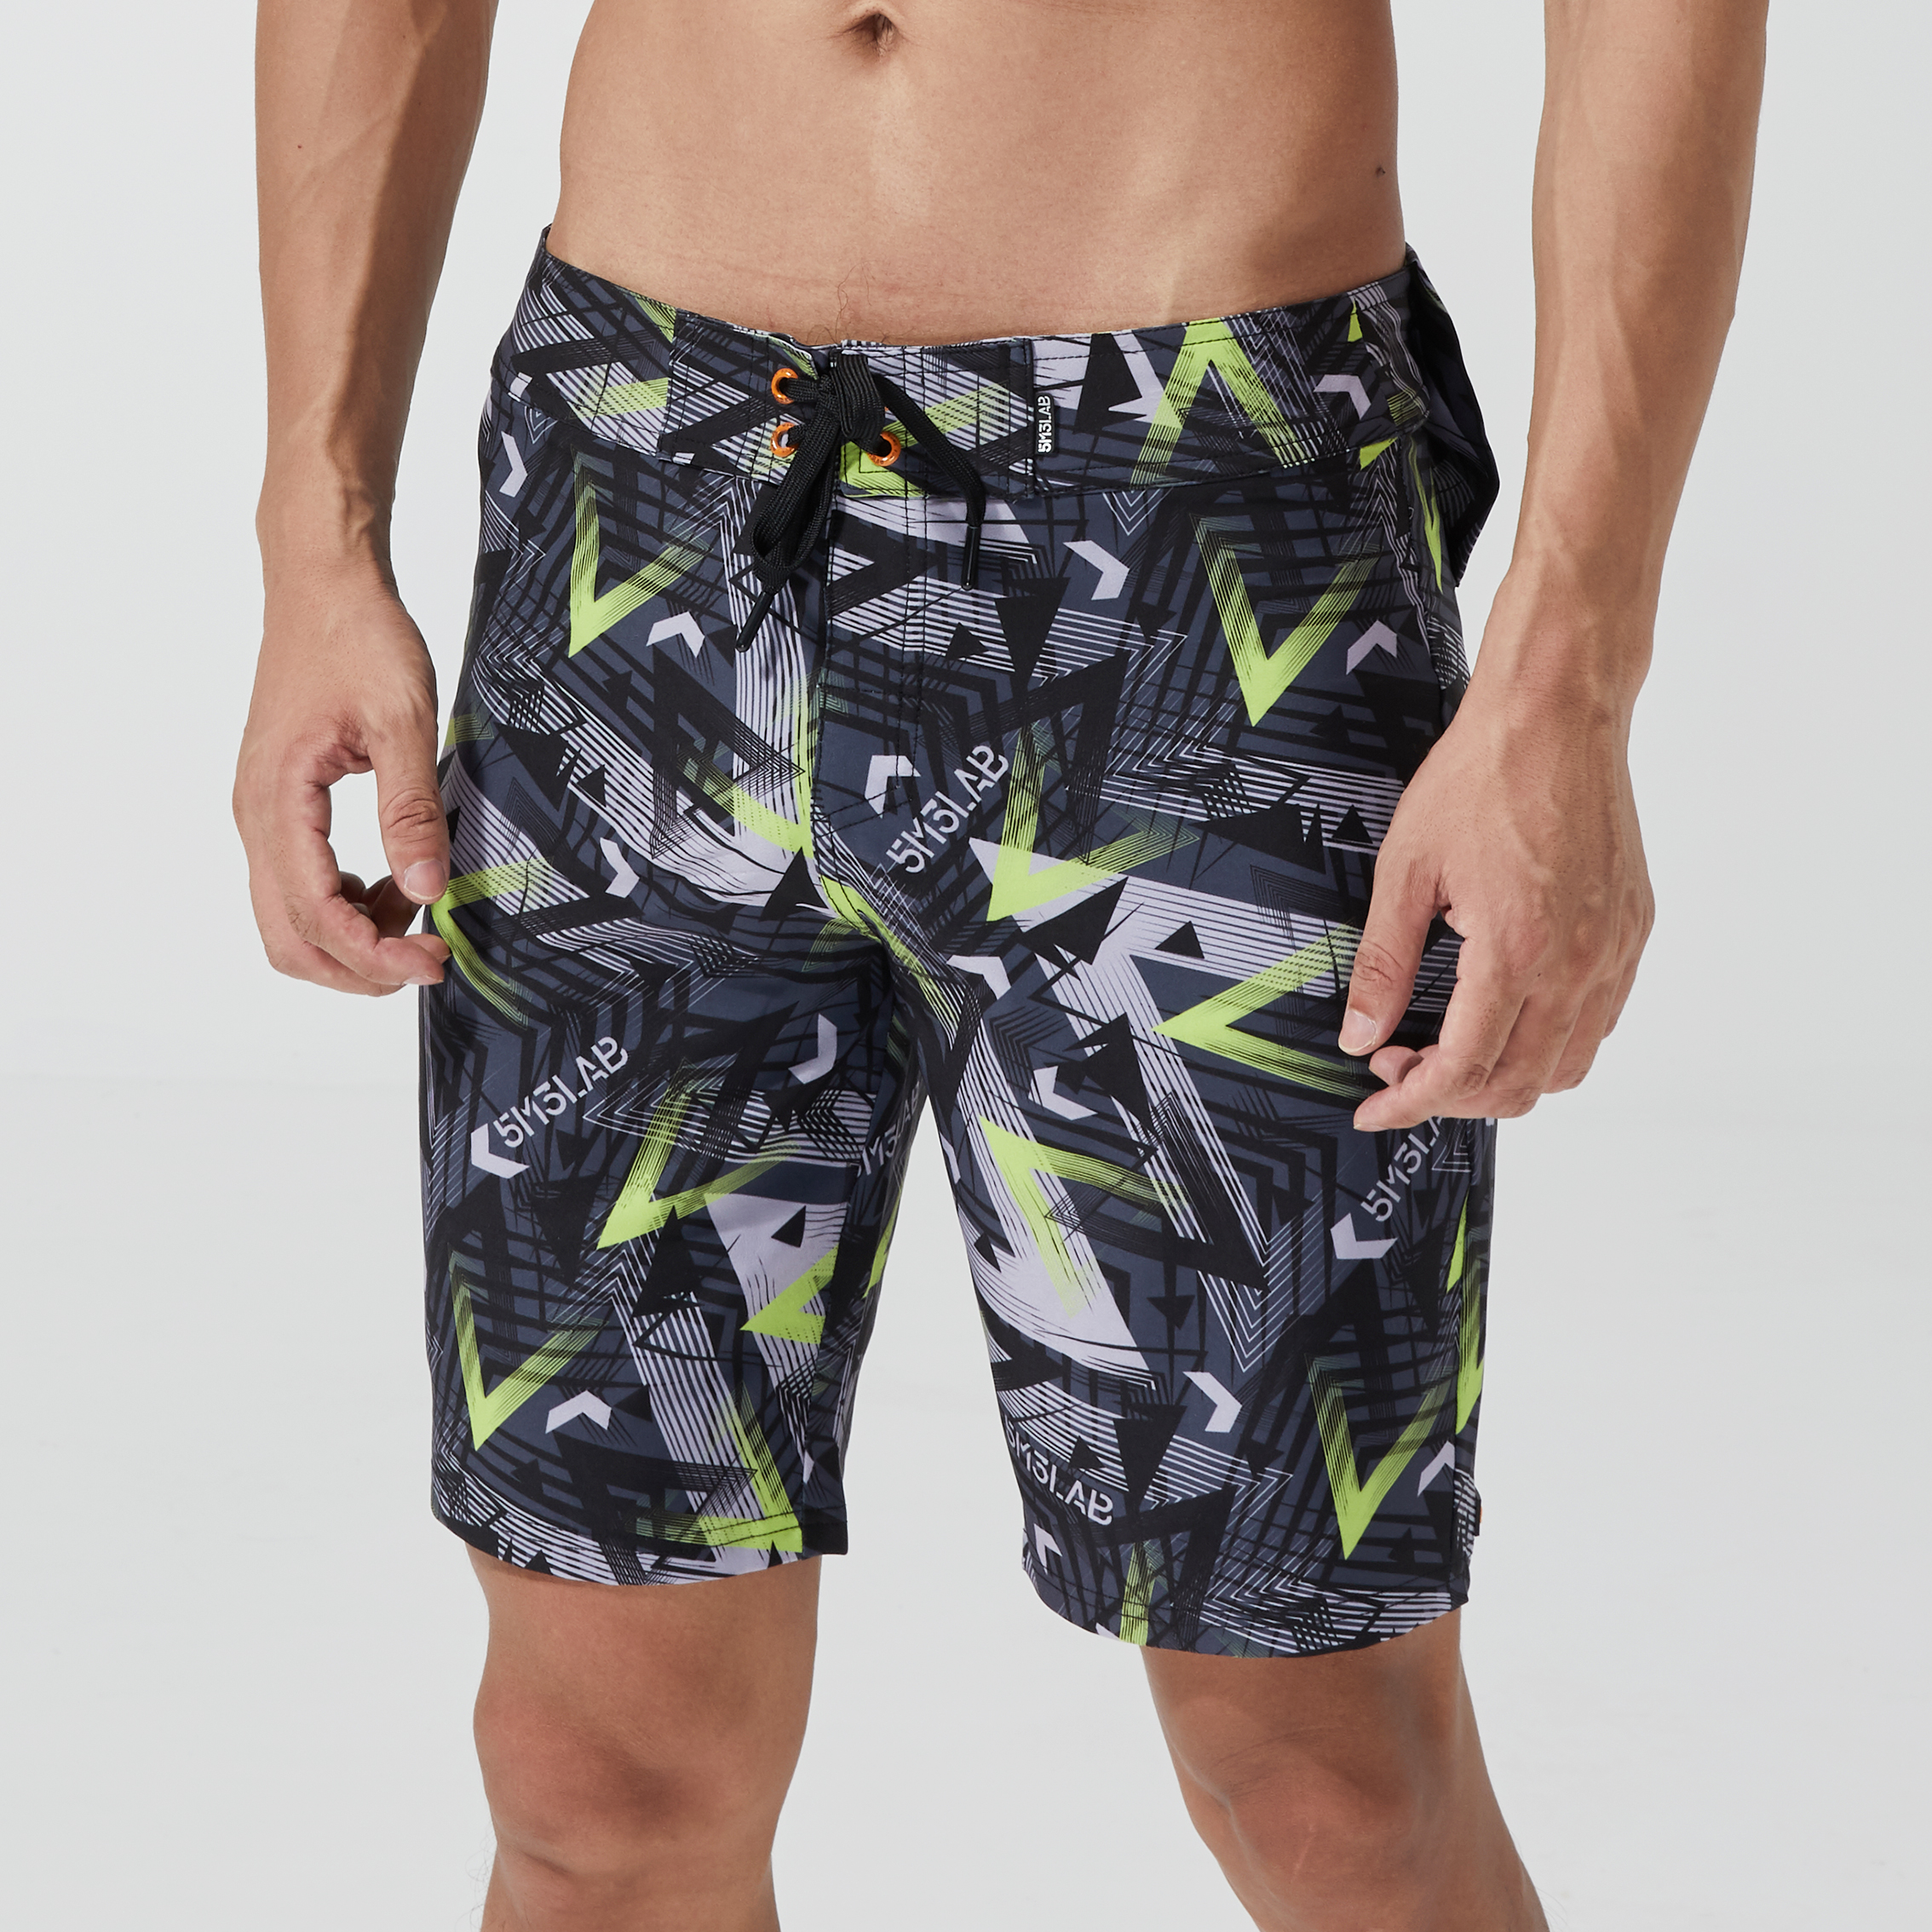 Nu-June Sfit Men Quick Dry Print Swimming Shorts For Men Swimwear Man Swimsuit Swim Trunks Summer Bathing Beach Wear Surf Boxer